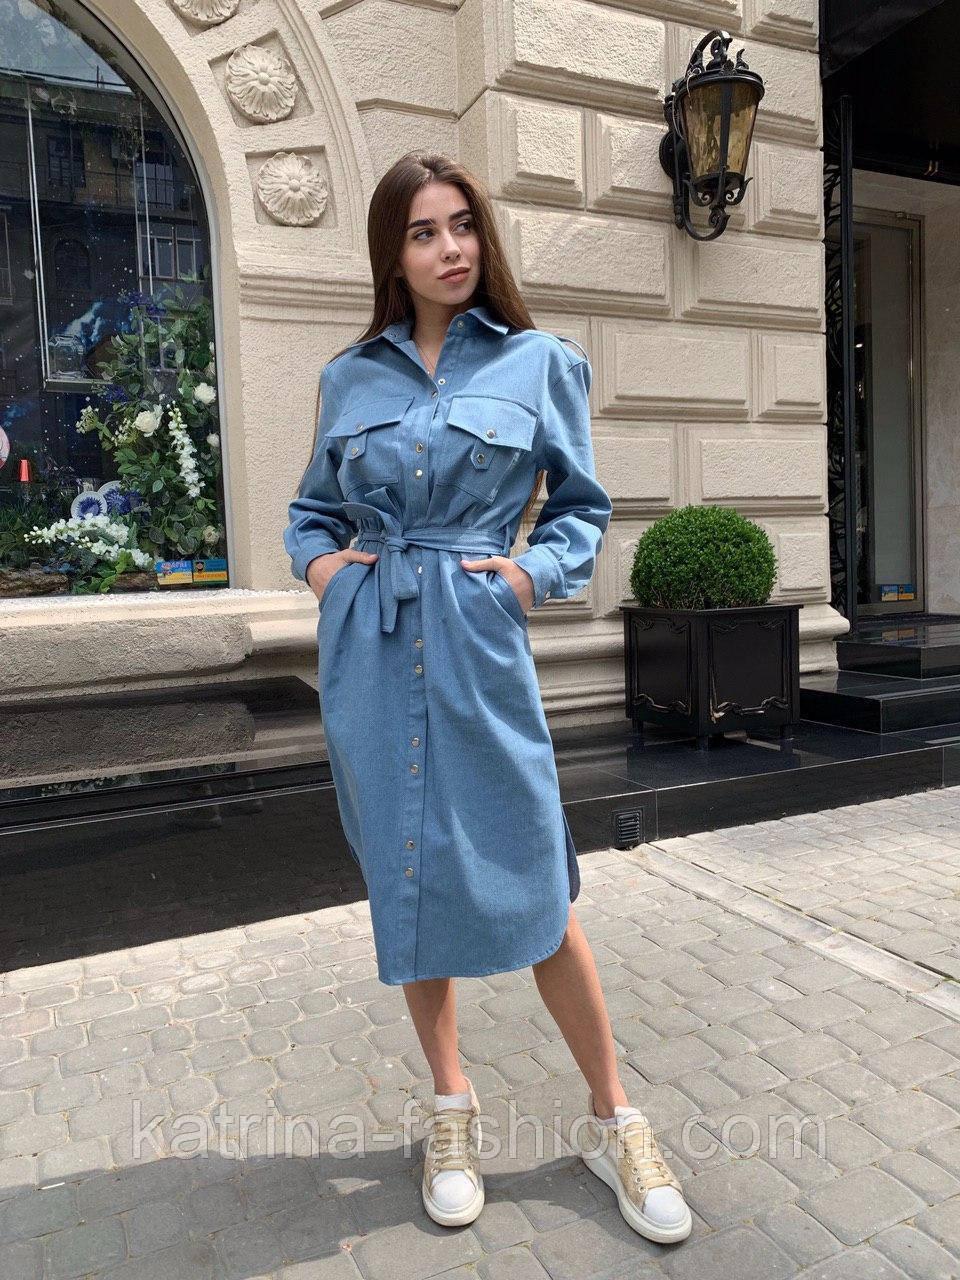 Жіноче джинсове плаття-сорочка з поясом